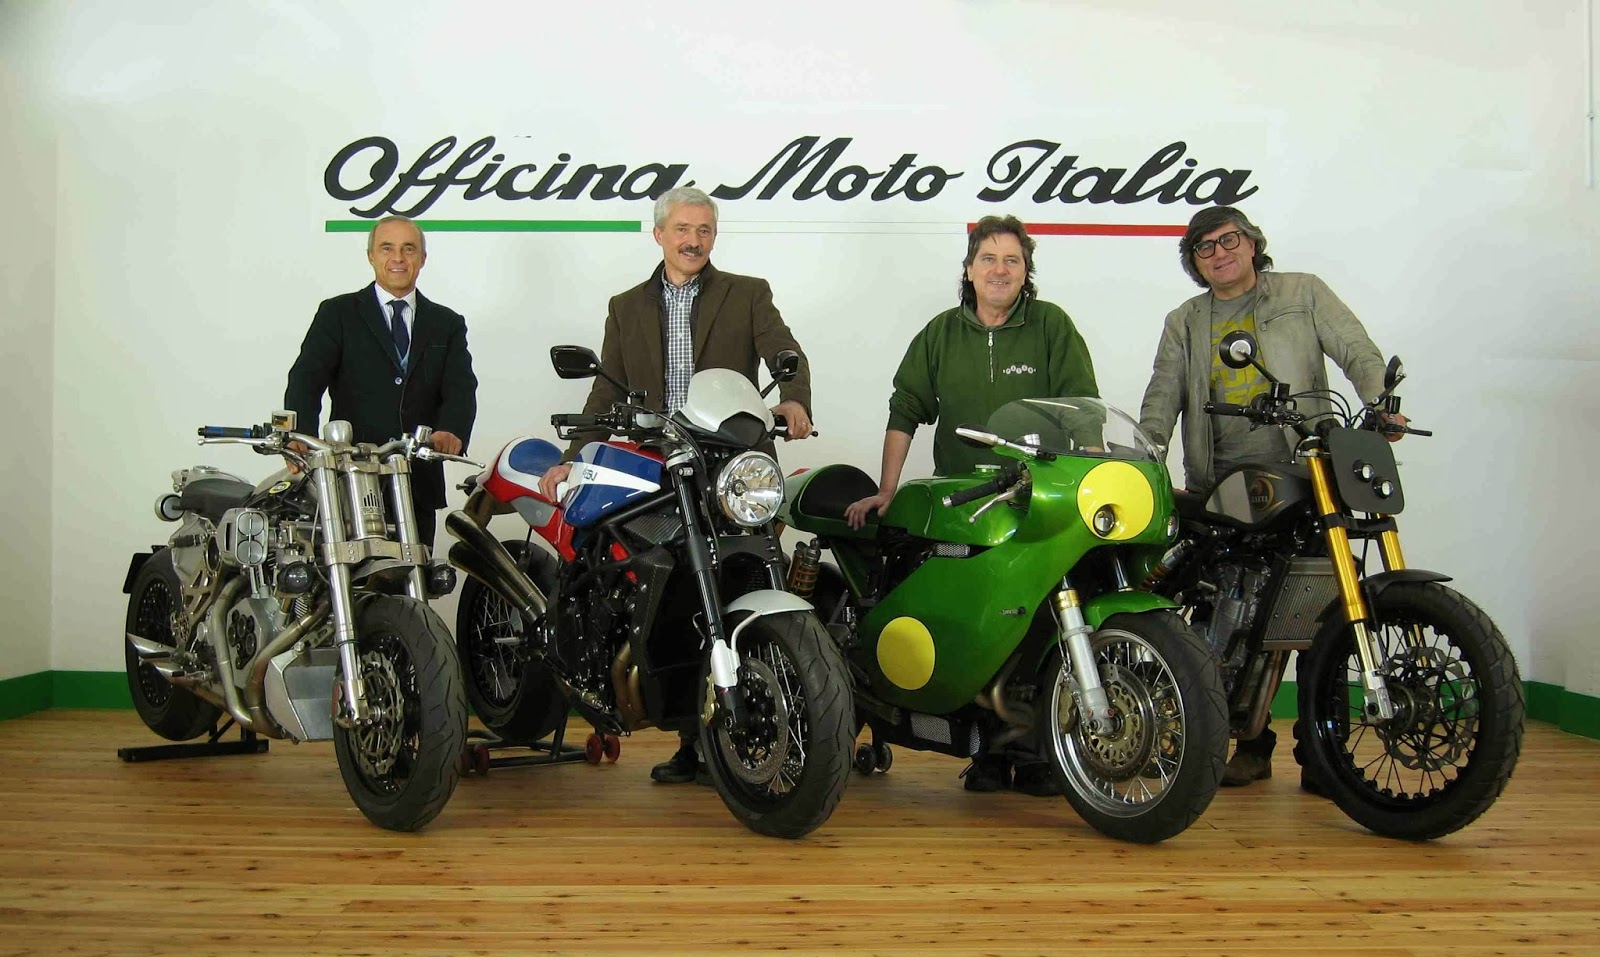 Italian motor magazine officina moto italia for Officina moto italia